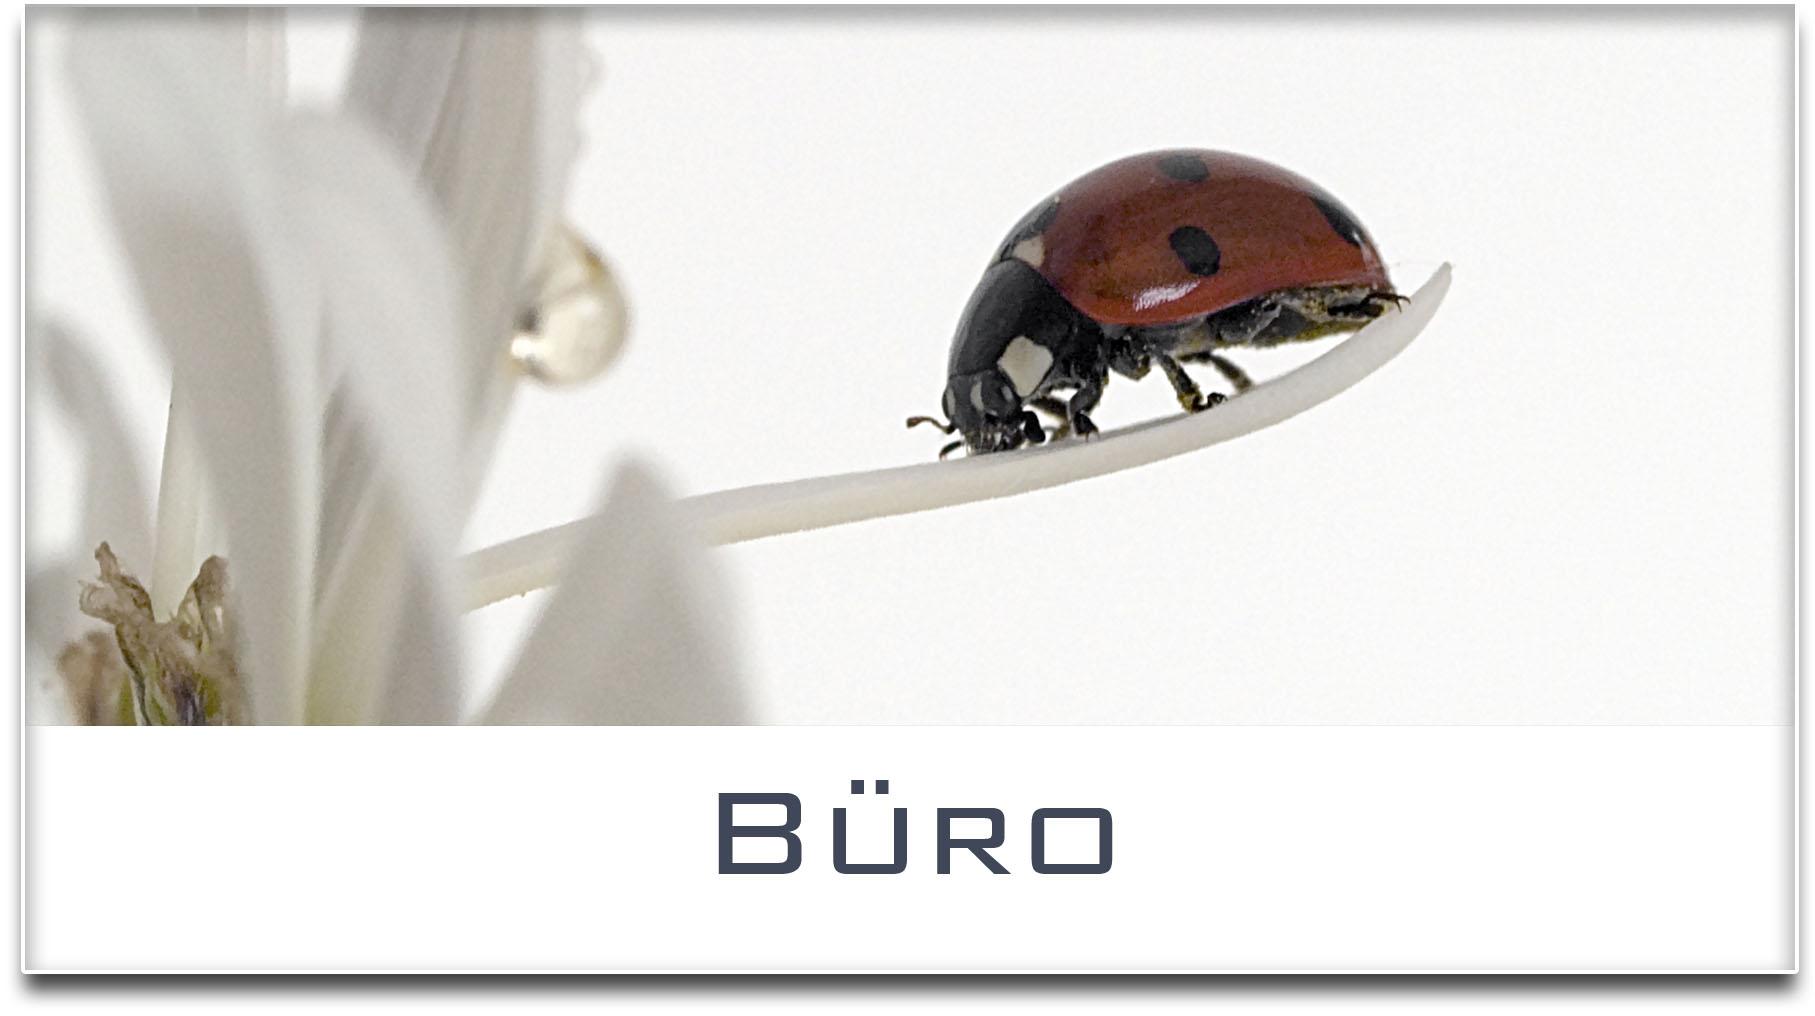 Türschild / Haustürschild / Marienkäfer / Büro / Selbstklebend